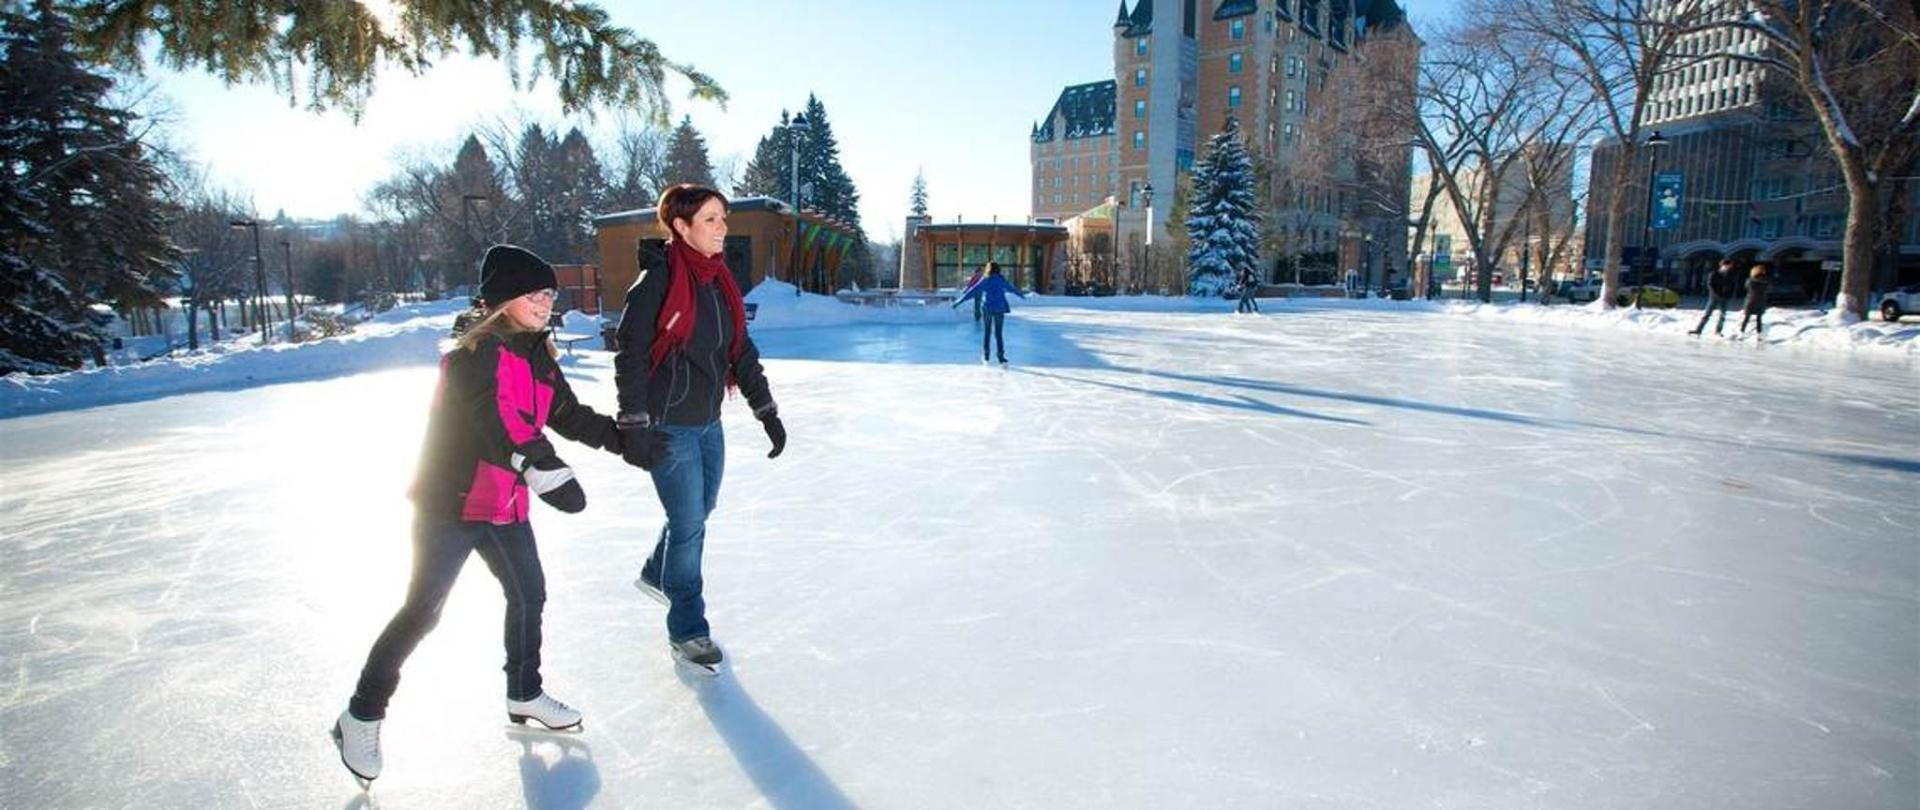 ice-skating-in-downtown-saskatoon-compliments-of-tourism-saskatoon.jpg.1140x481_default.jpg